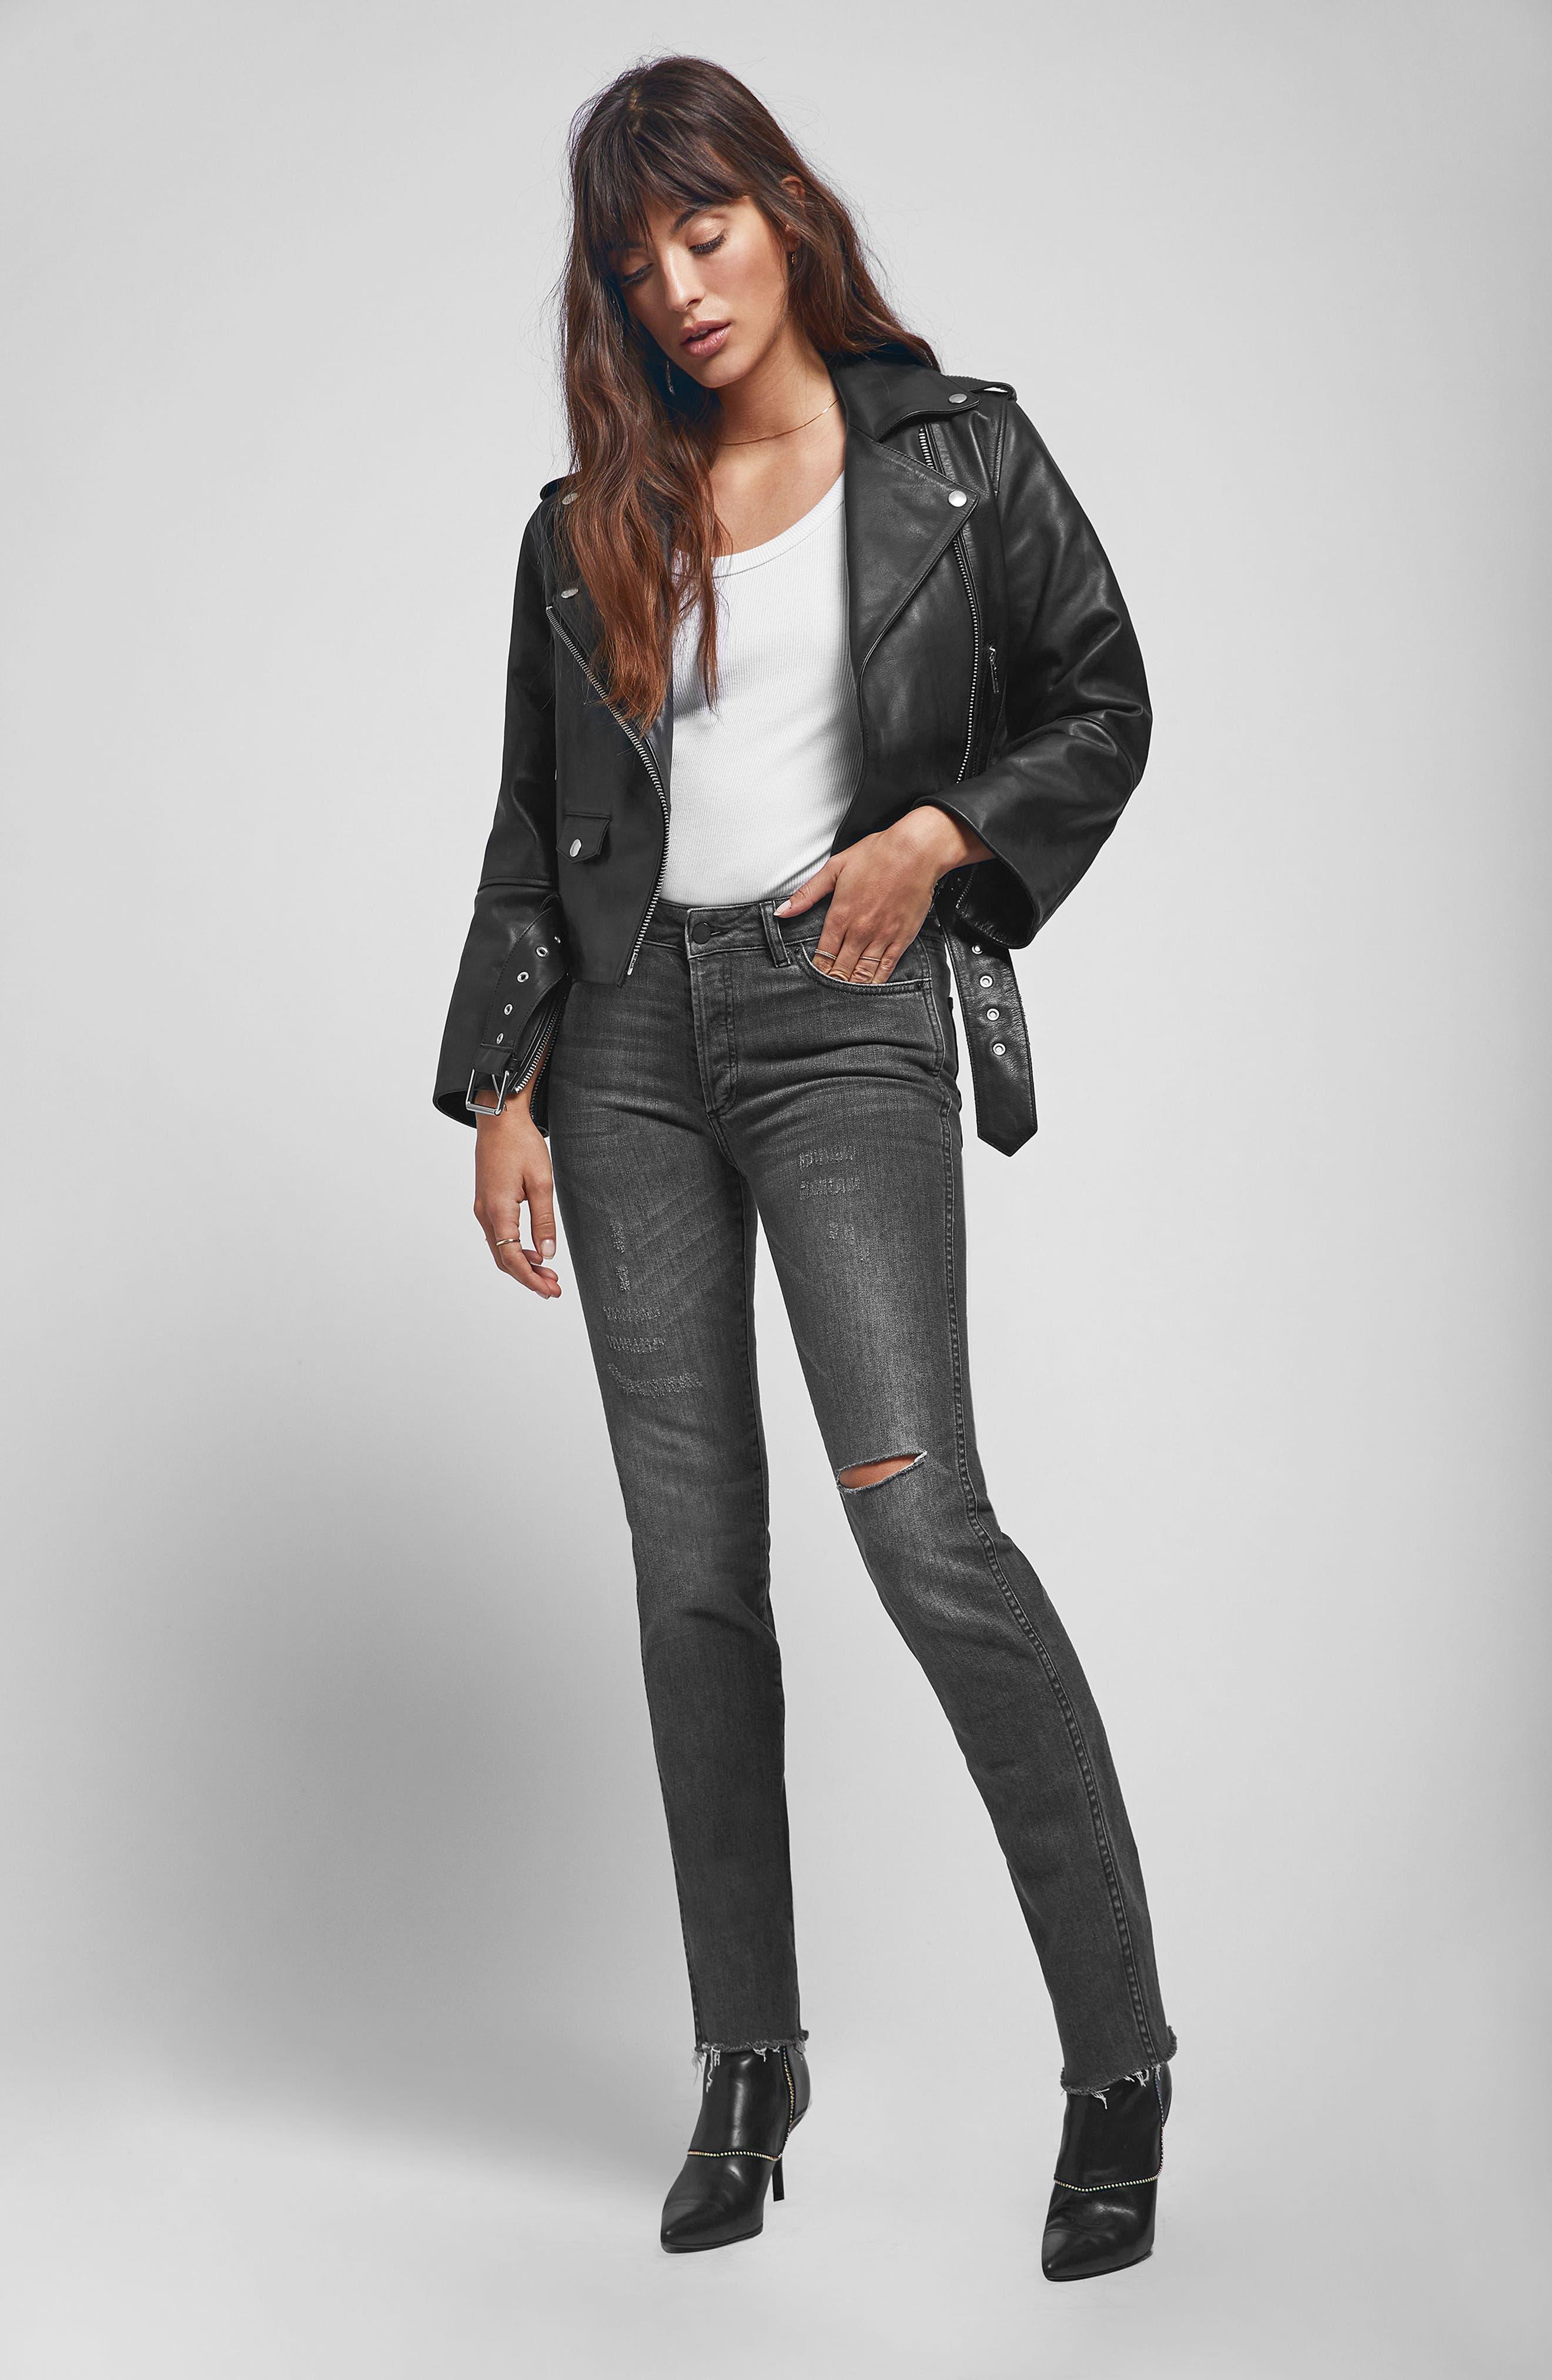 Kara Skinny Jeans,                             Alternate thumbnail 7, color,                             CHARCOAL